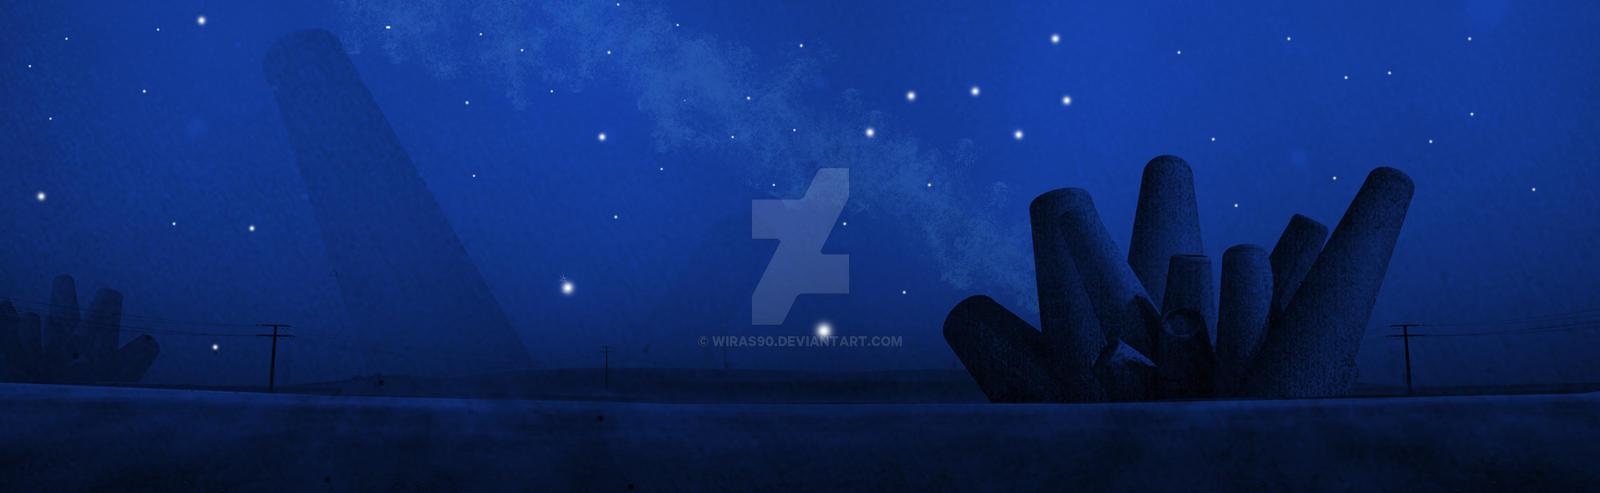 Starry Night by wiras90